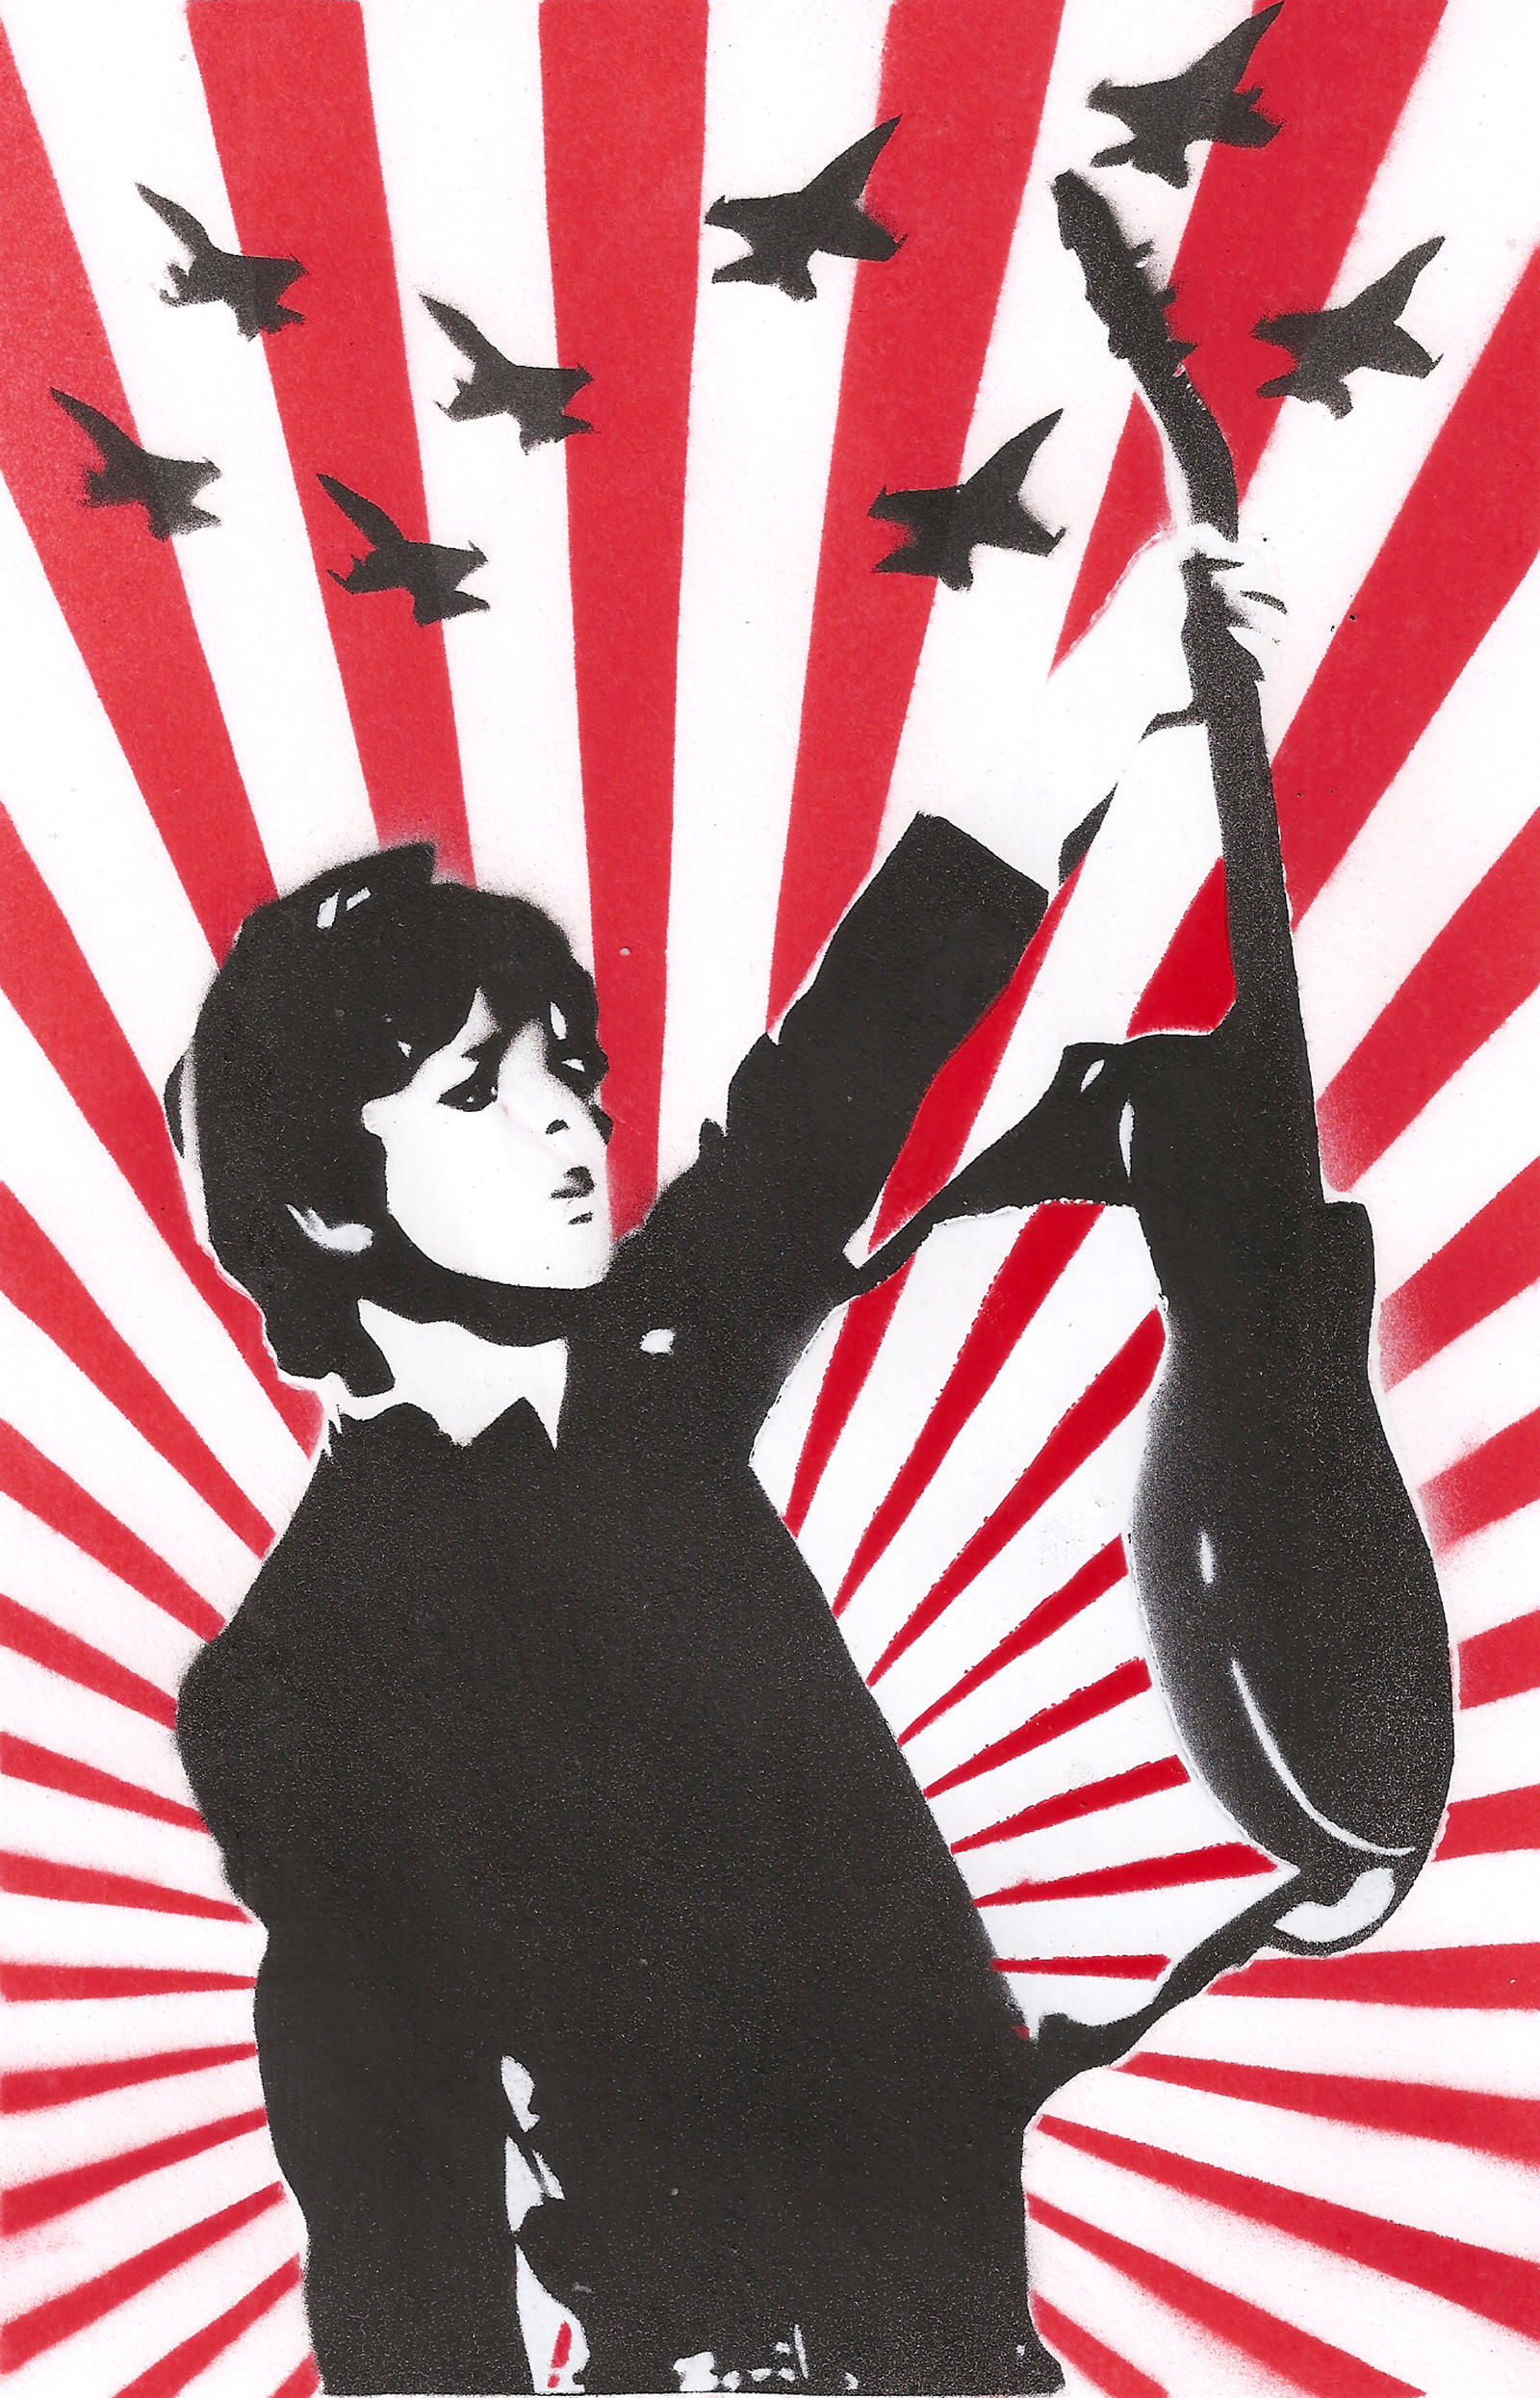 Billie Joe Armstrong - Stencil by theraineydaze on DeviantArt Joe Freeman